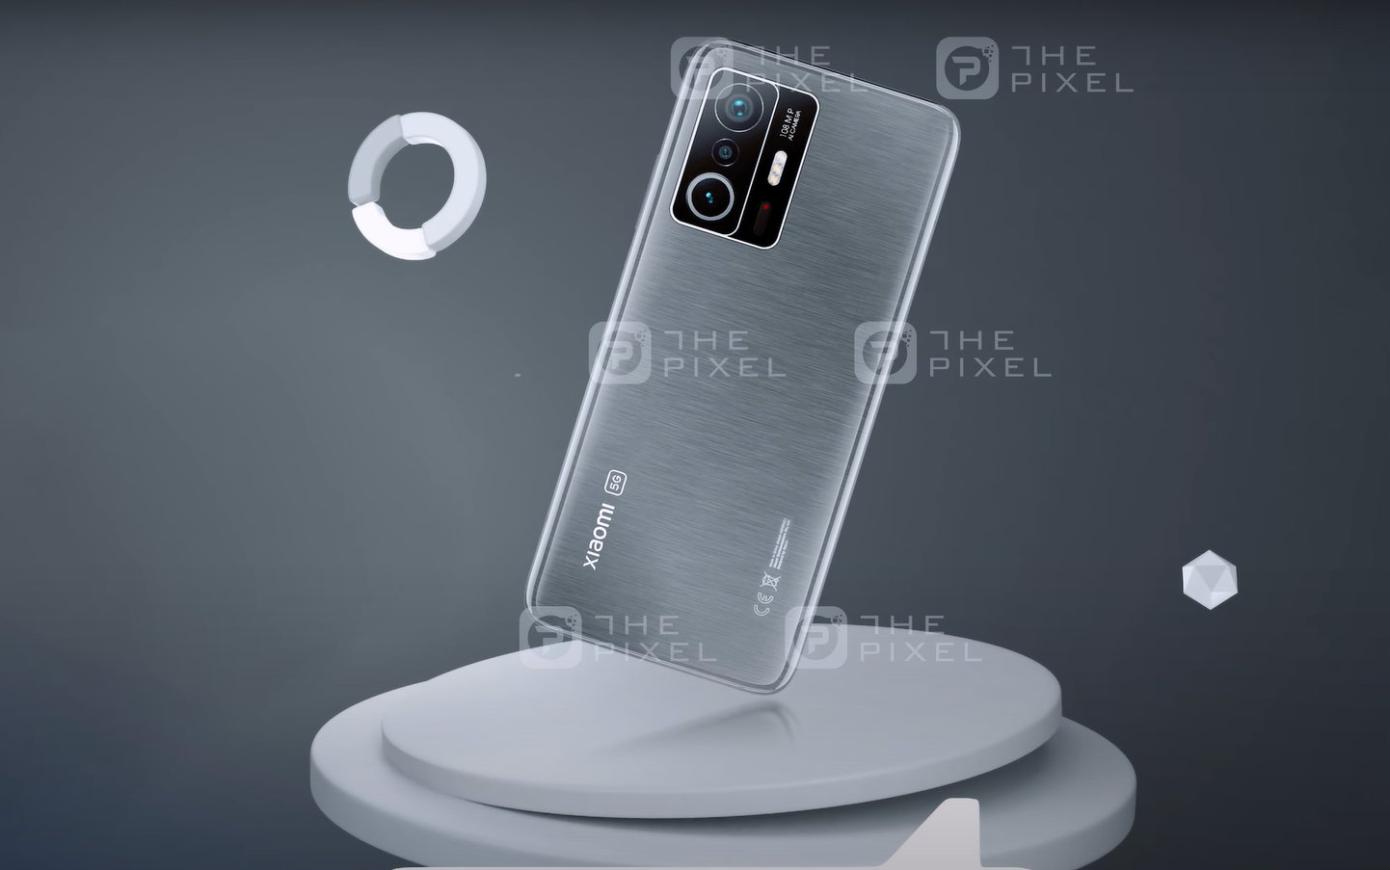 Novosti Ob Android 12 Funkczionale Mi 11t I Ocherednom Smeshhenii Apple S Liderstva 10